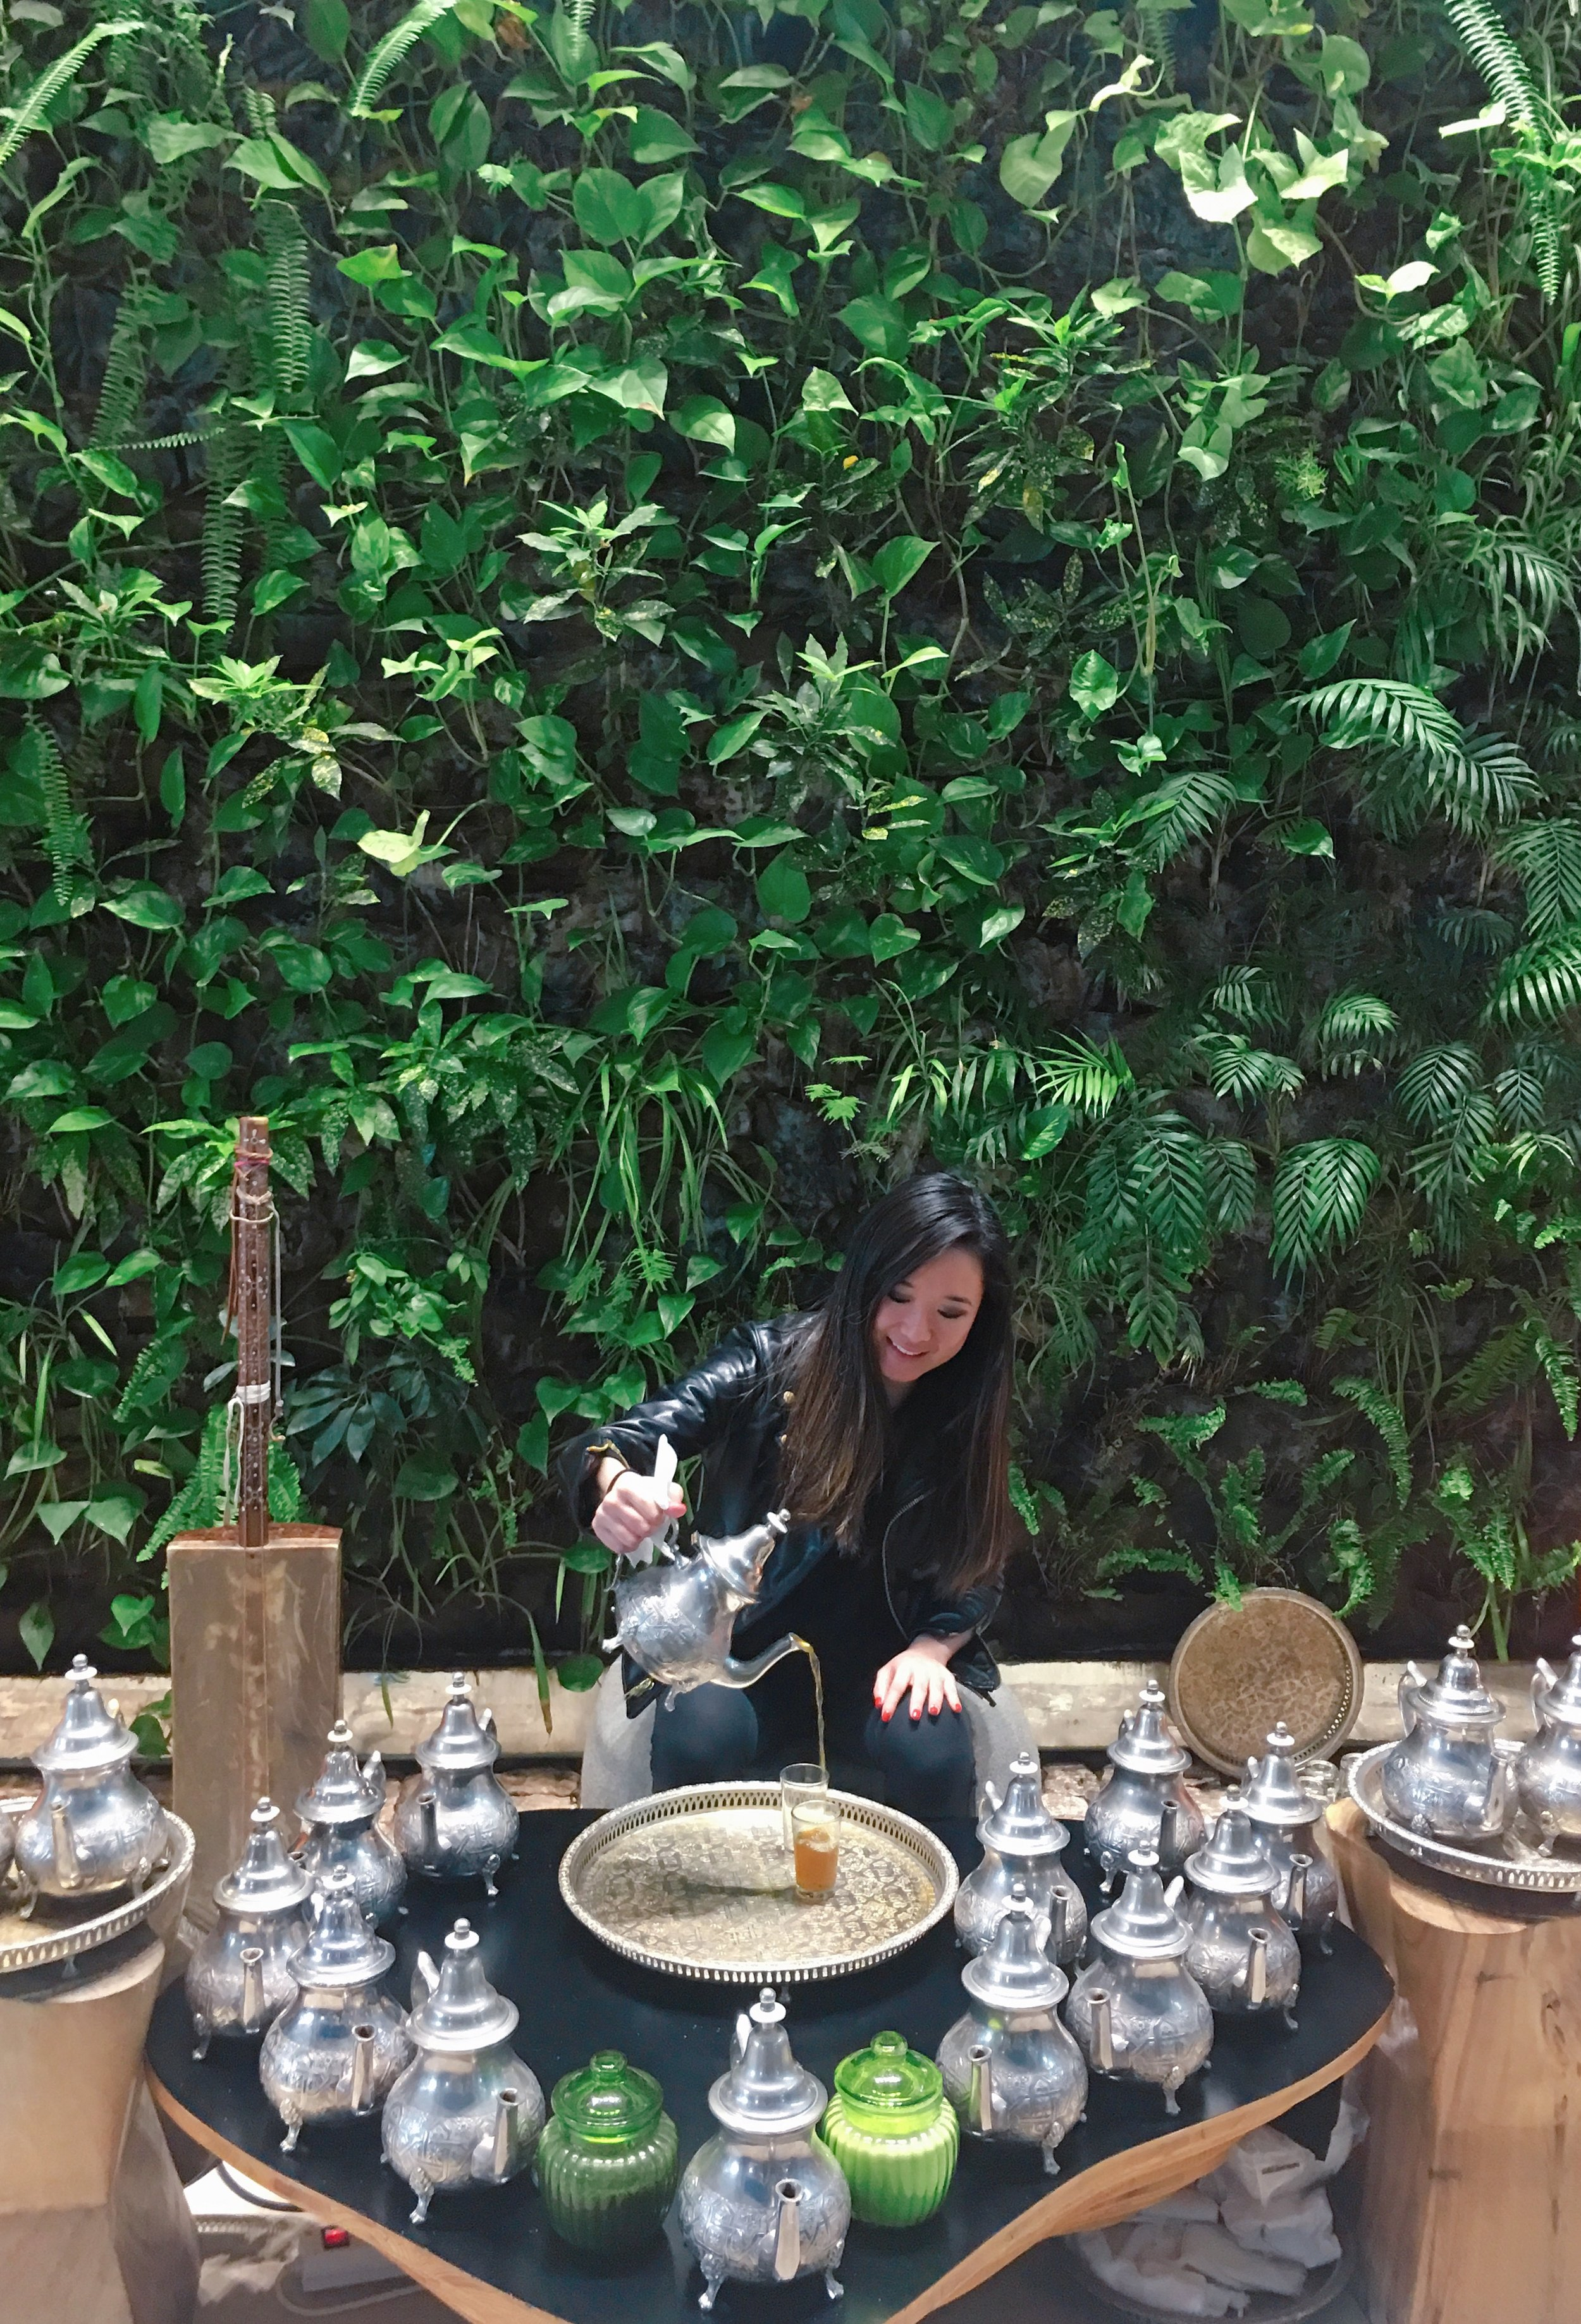 Moroccan tea ceremony